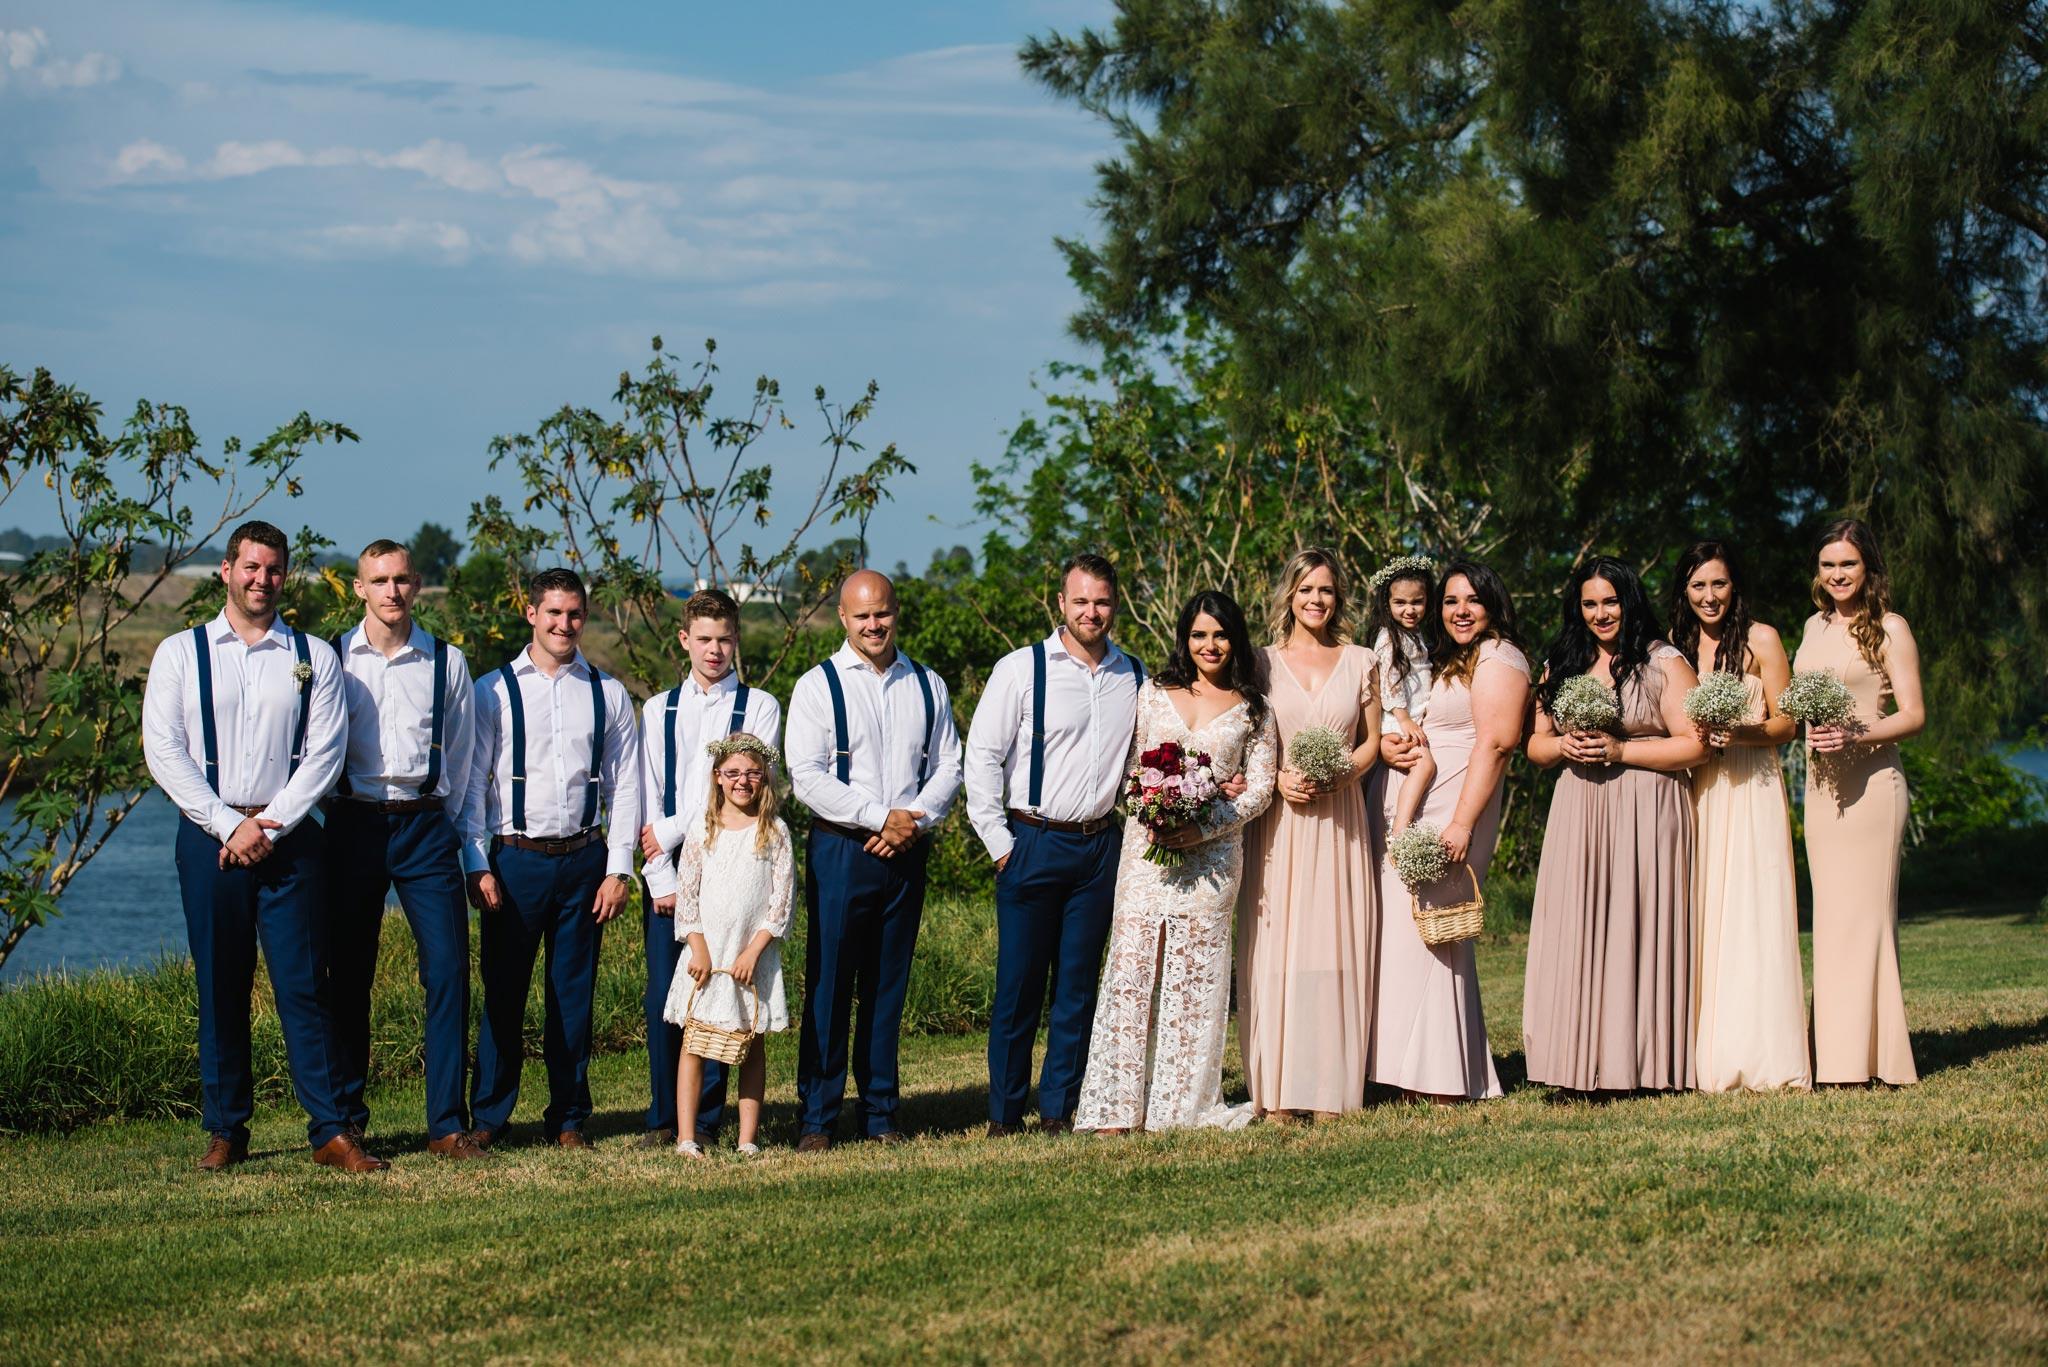 Bridal-party-at-country-wedding-Hawkesbury-River-NSW.jpg